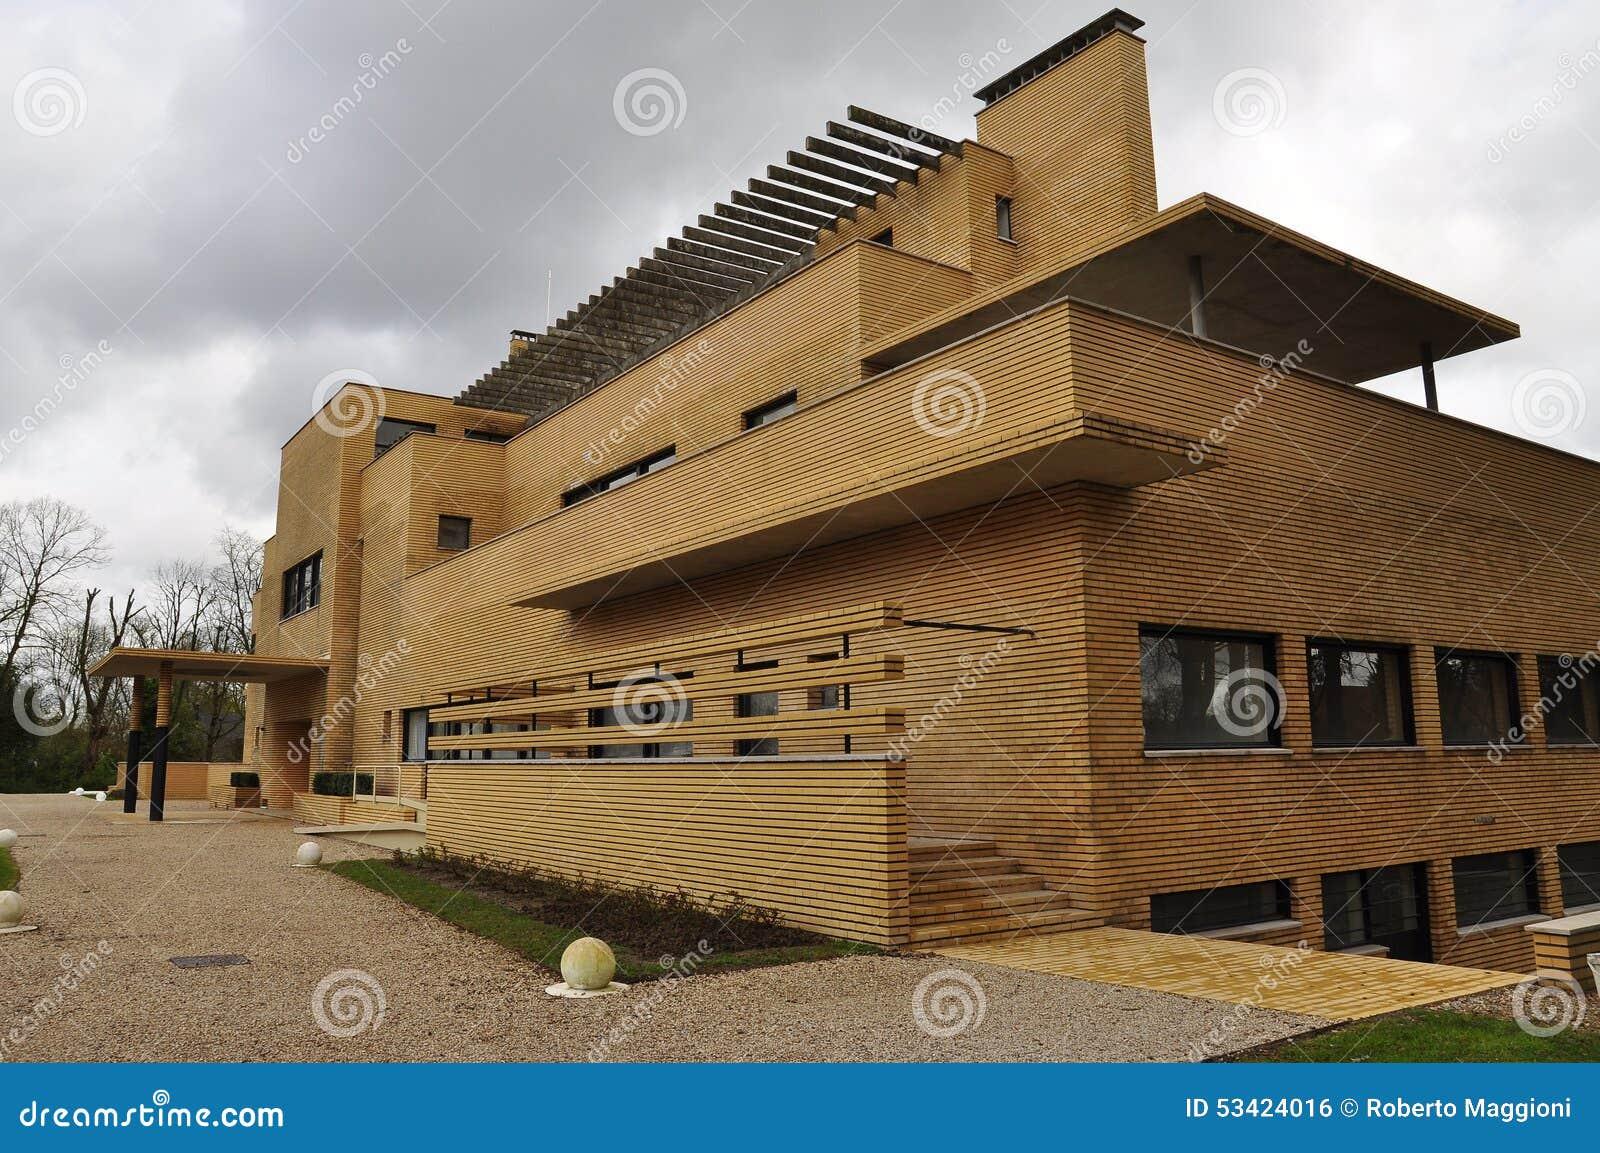 villa cavrois architecture moderniste roubaix france photo stock image 53424016. Black Bedroom Furniture Sets. Home Design Ideas